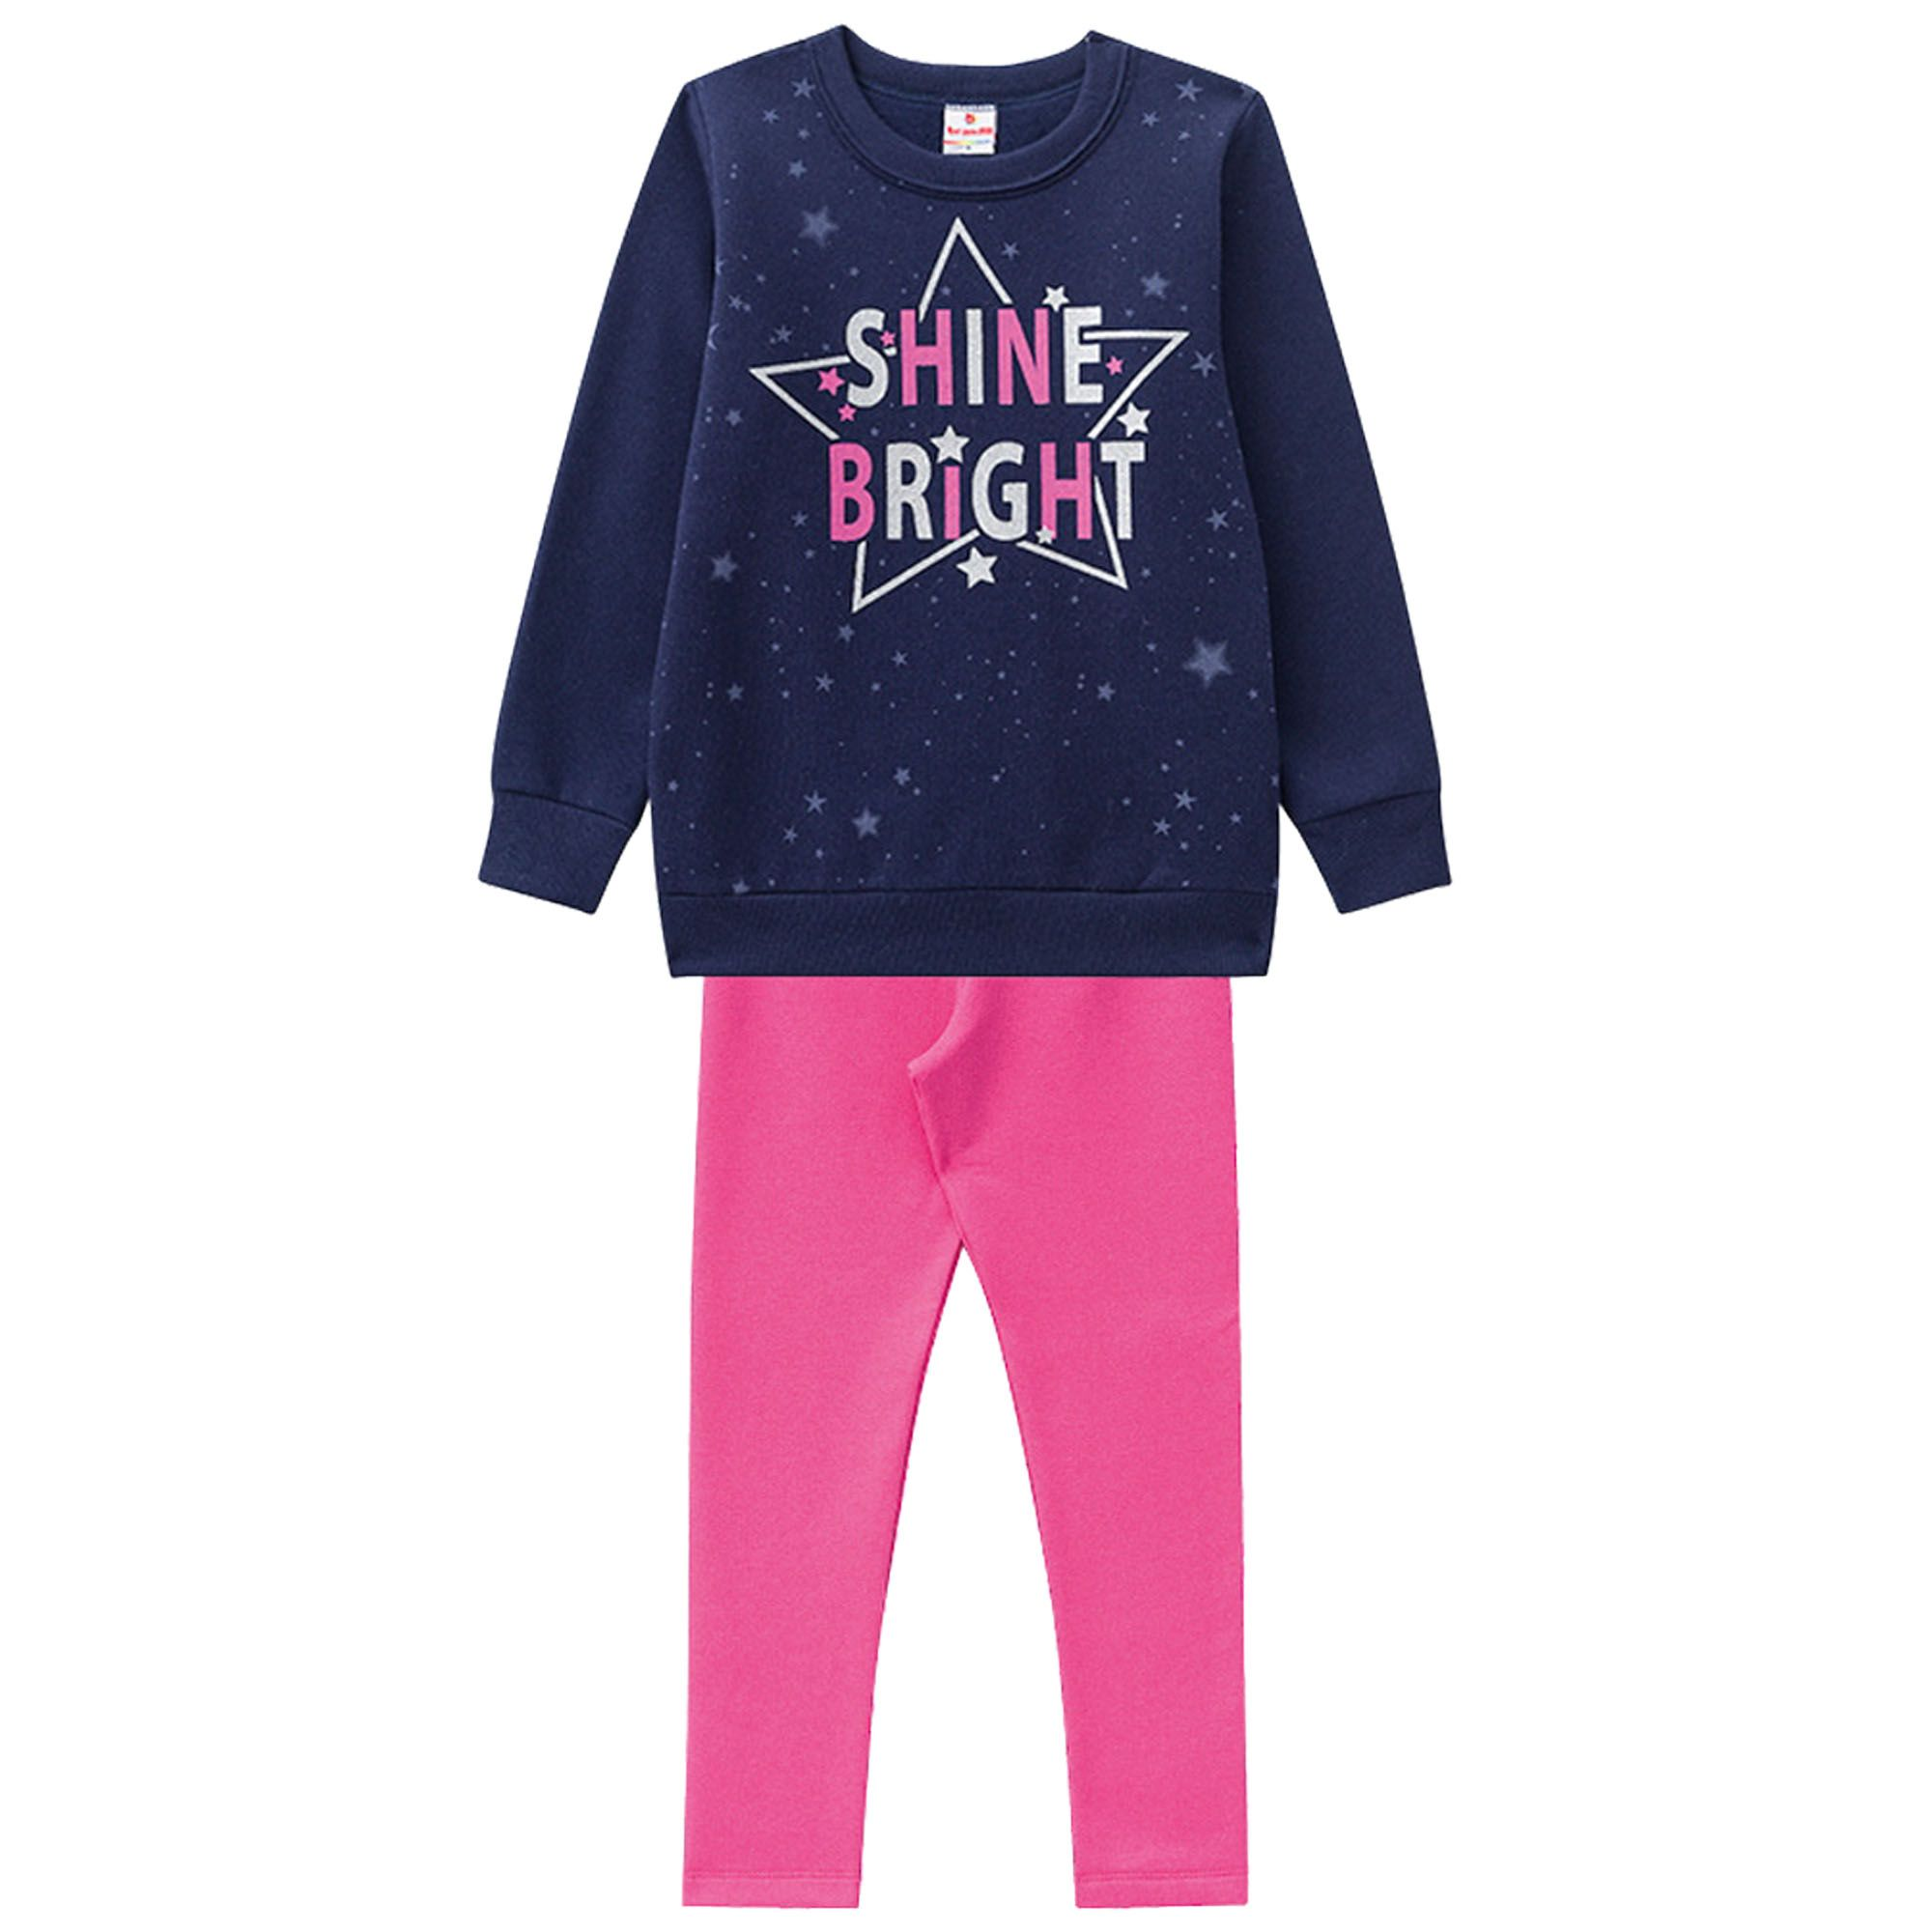 Conjunto Inverno Brandili Estampado Estrela Shine Bright com Legging - 4 e 6